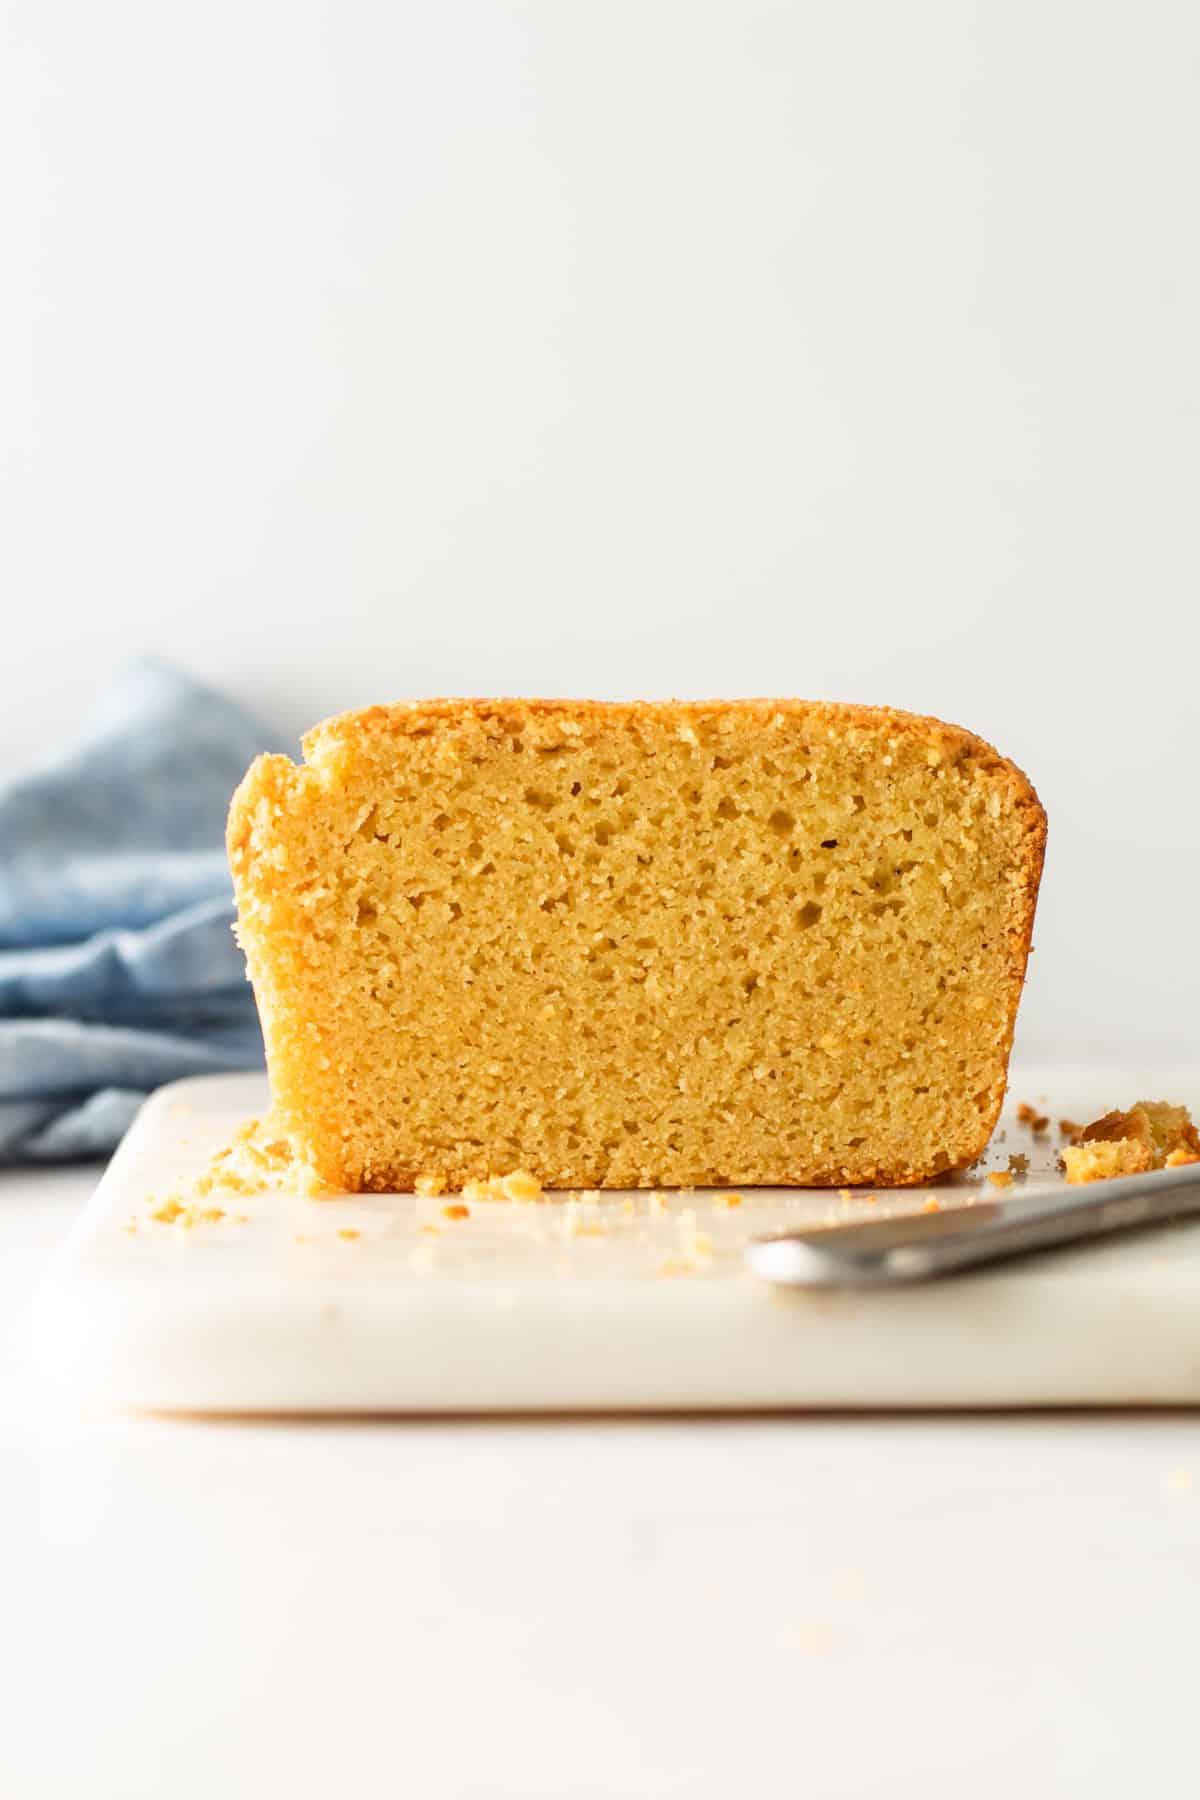 Gluten-free pound cake.